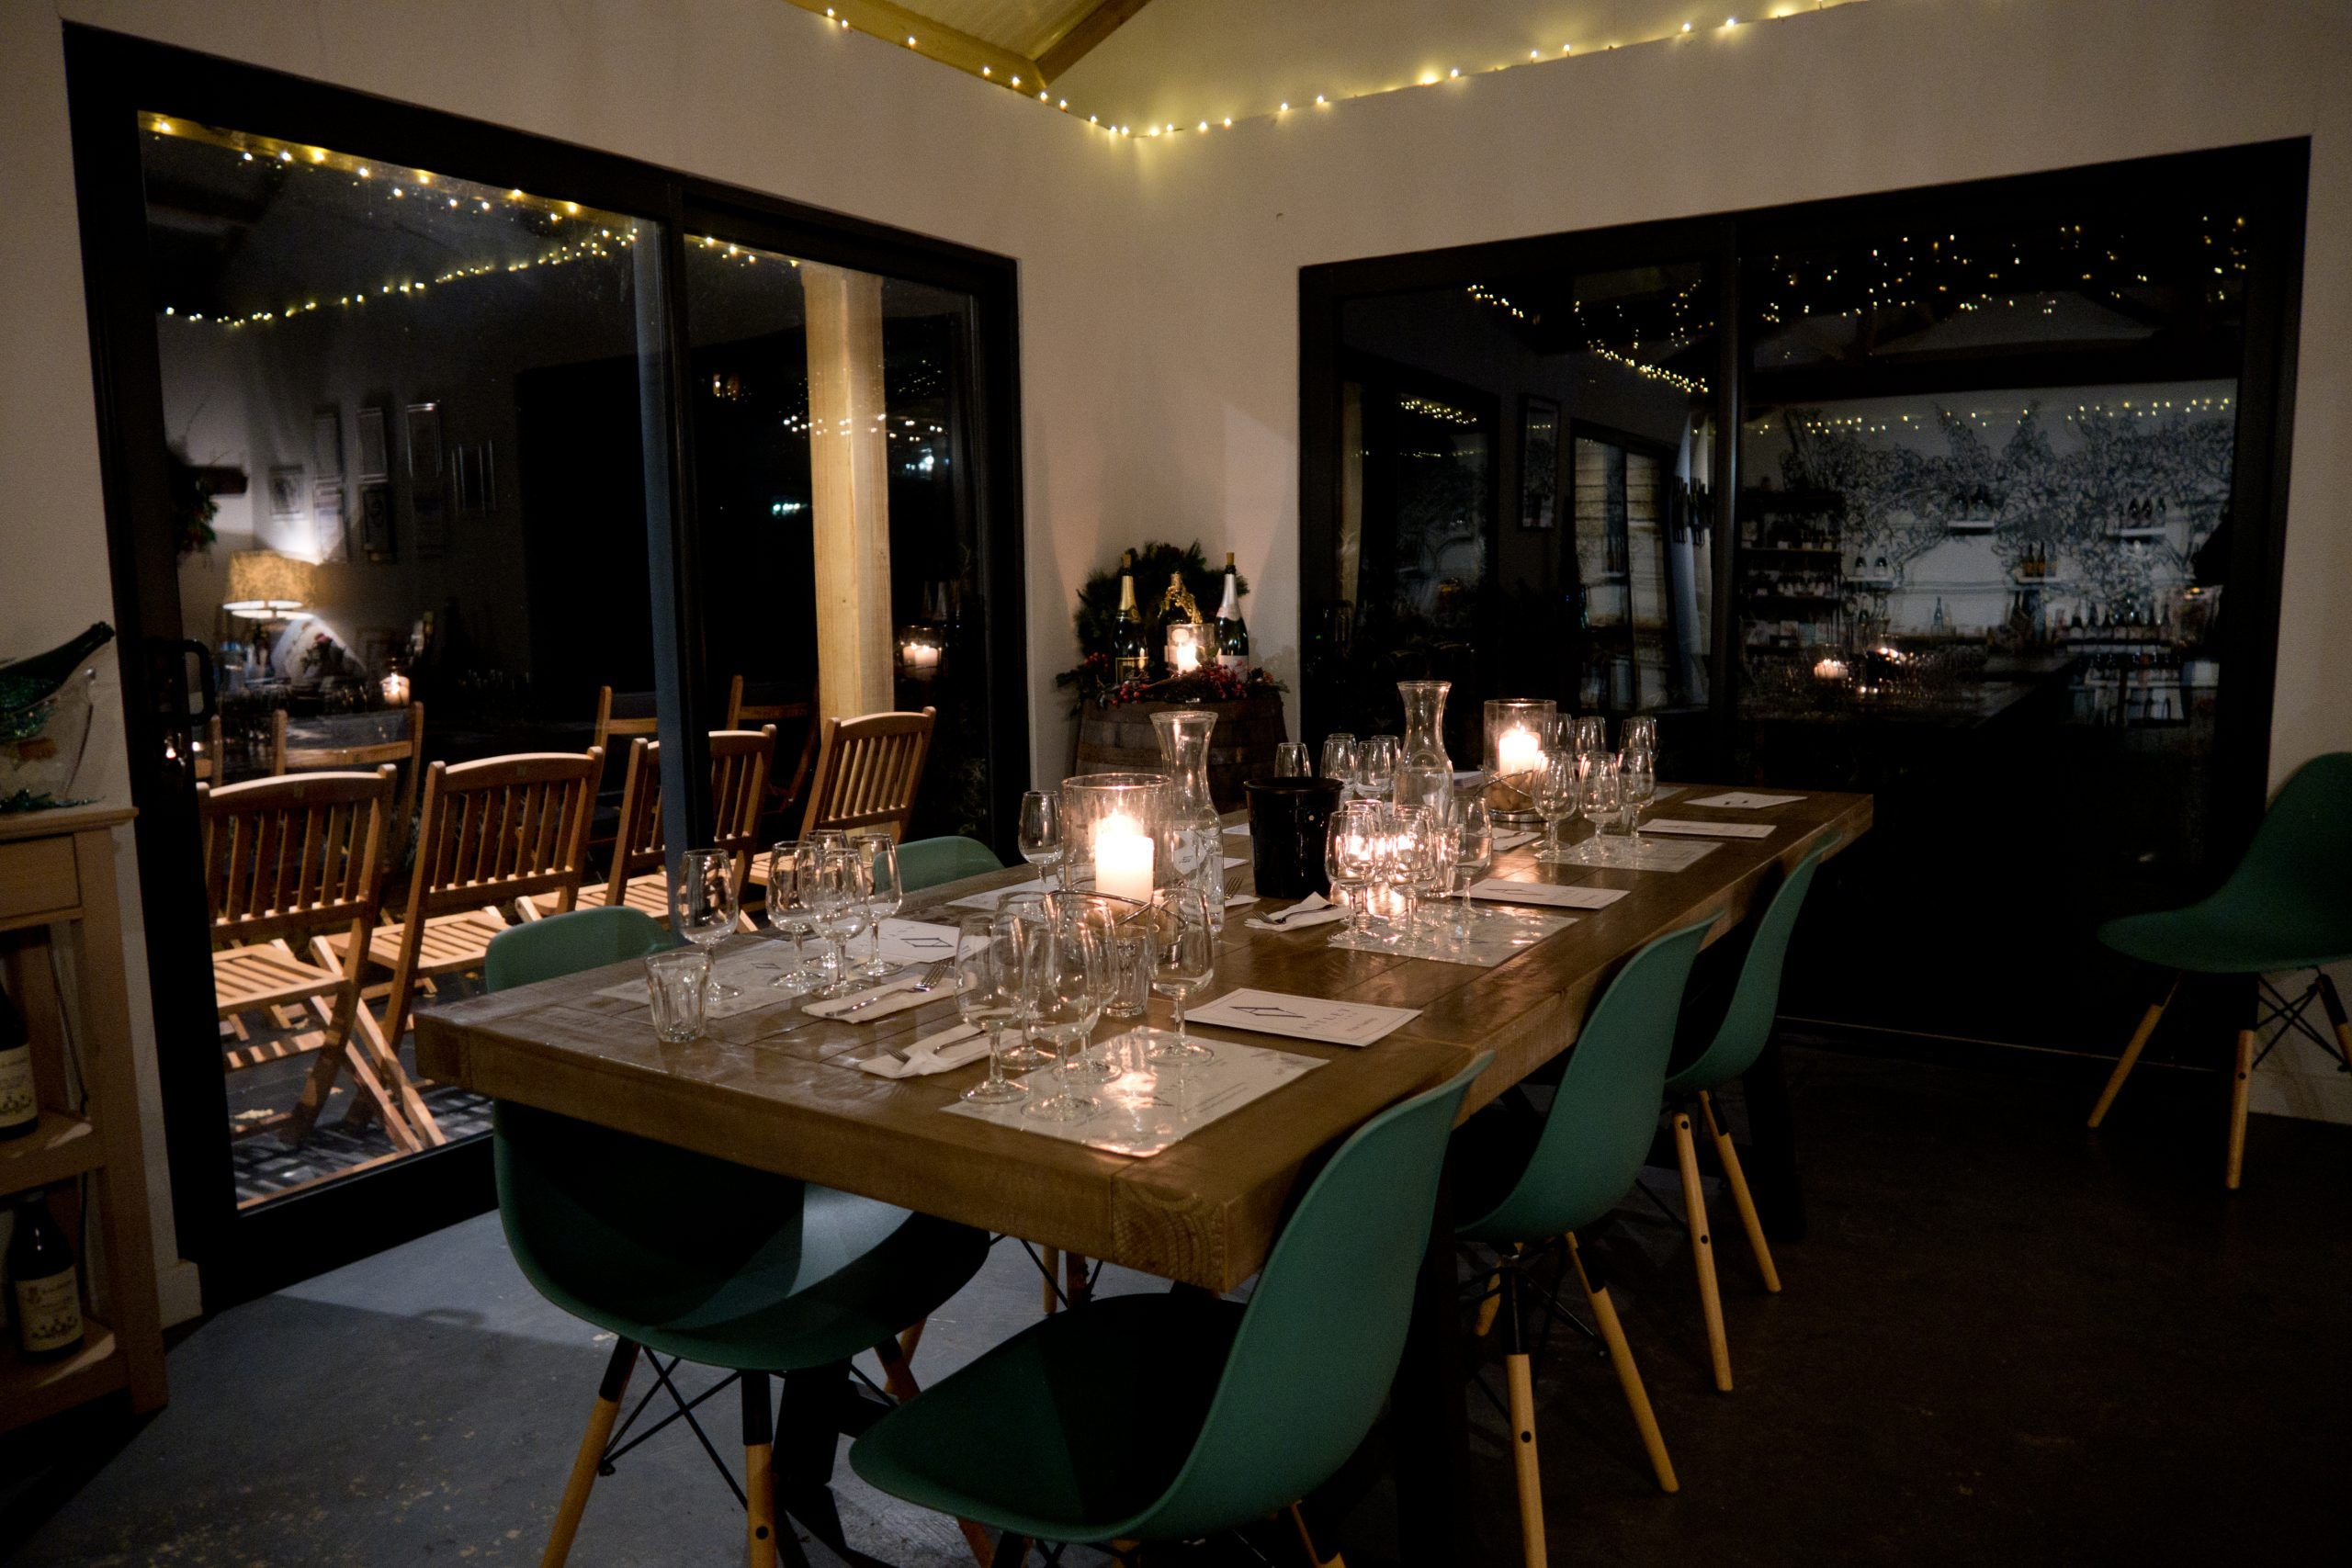 Astley Vineyard - evening wine tasting event